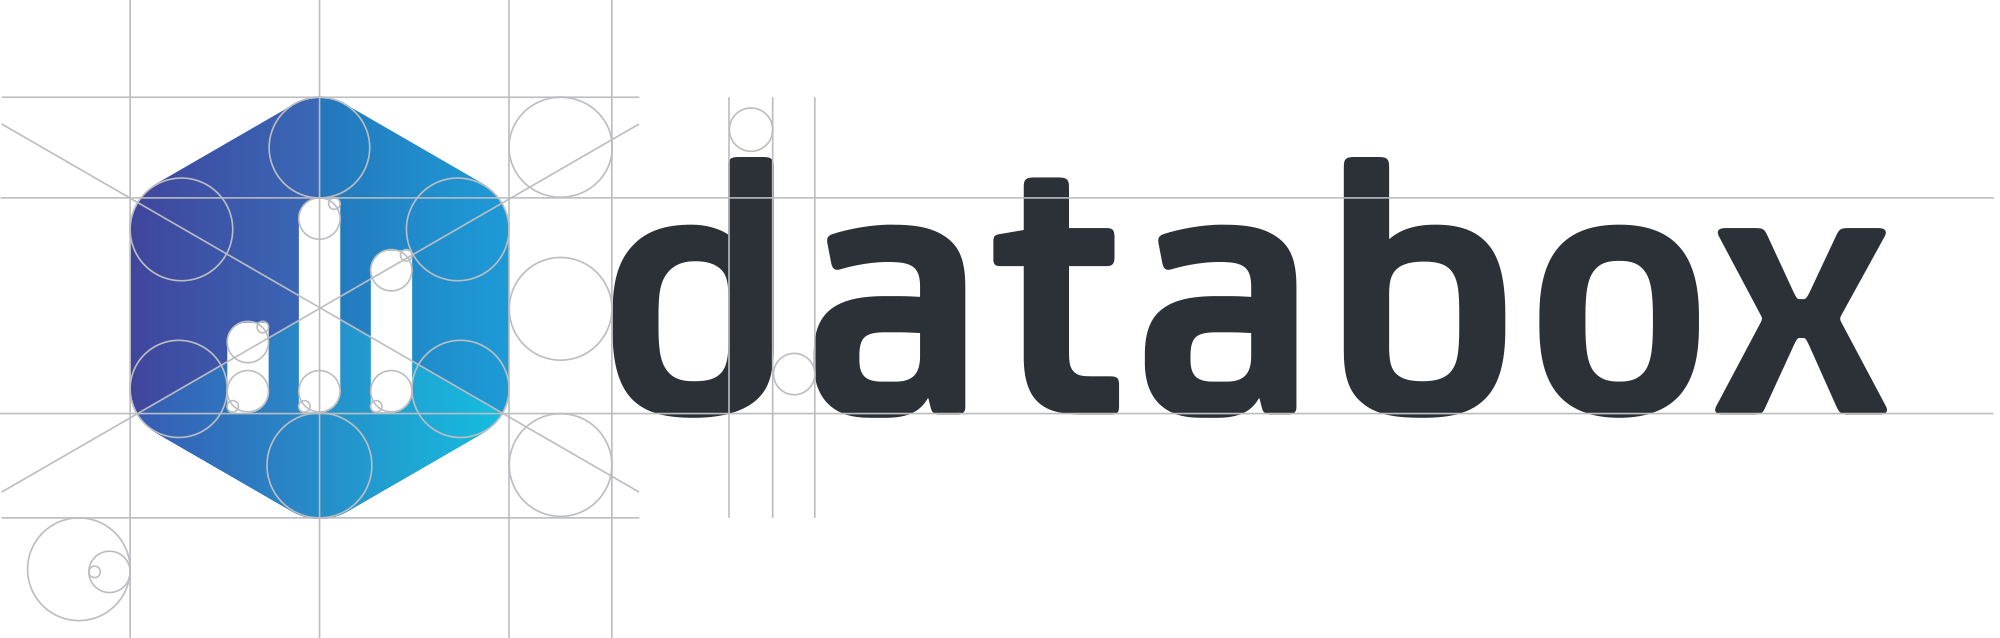 databox logo png.png